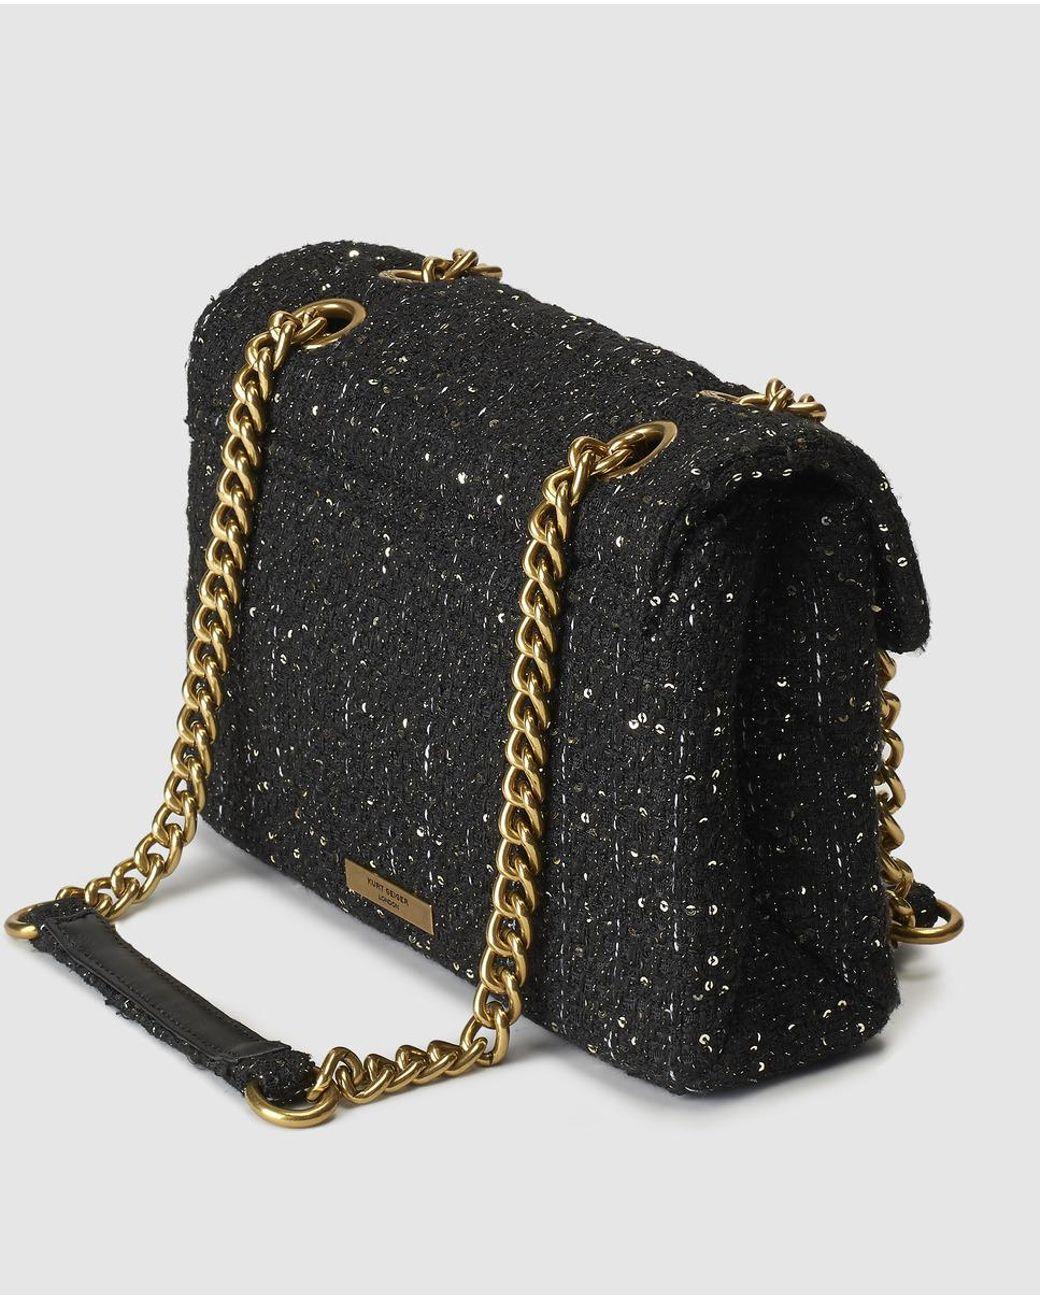 3ad4e1a7f912 Kurt Geiger Kensington Large Black Tweed Crossbody Bag With Sequins in Black  - Lyst